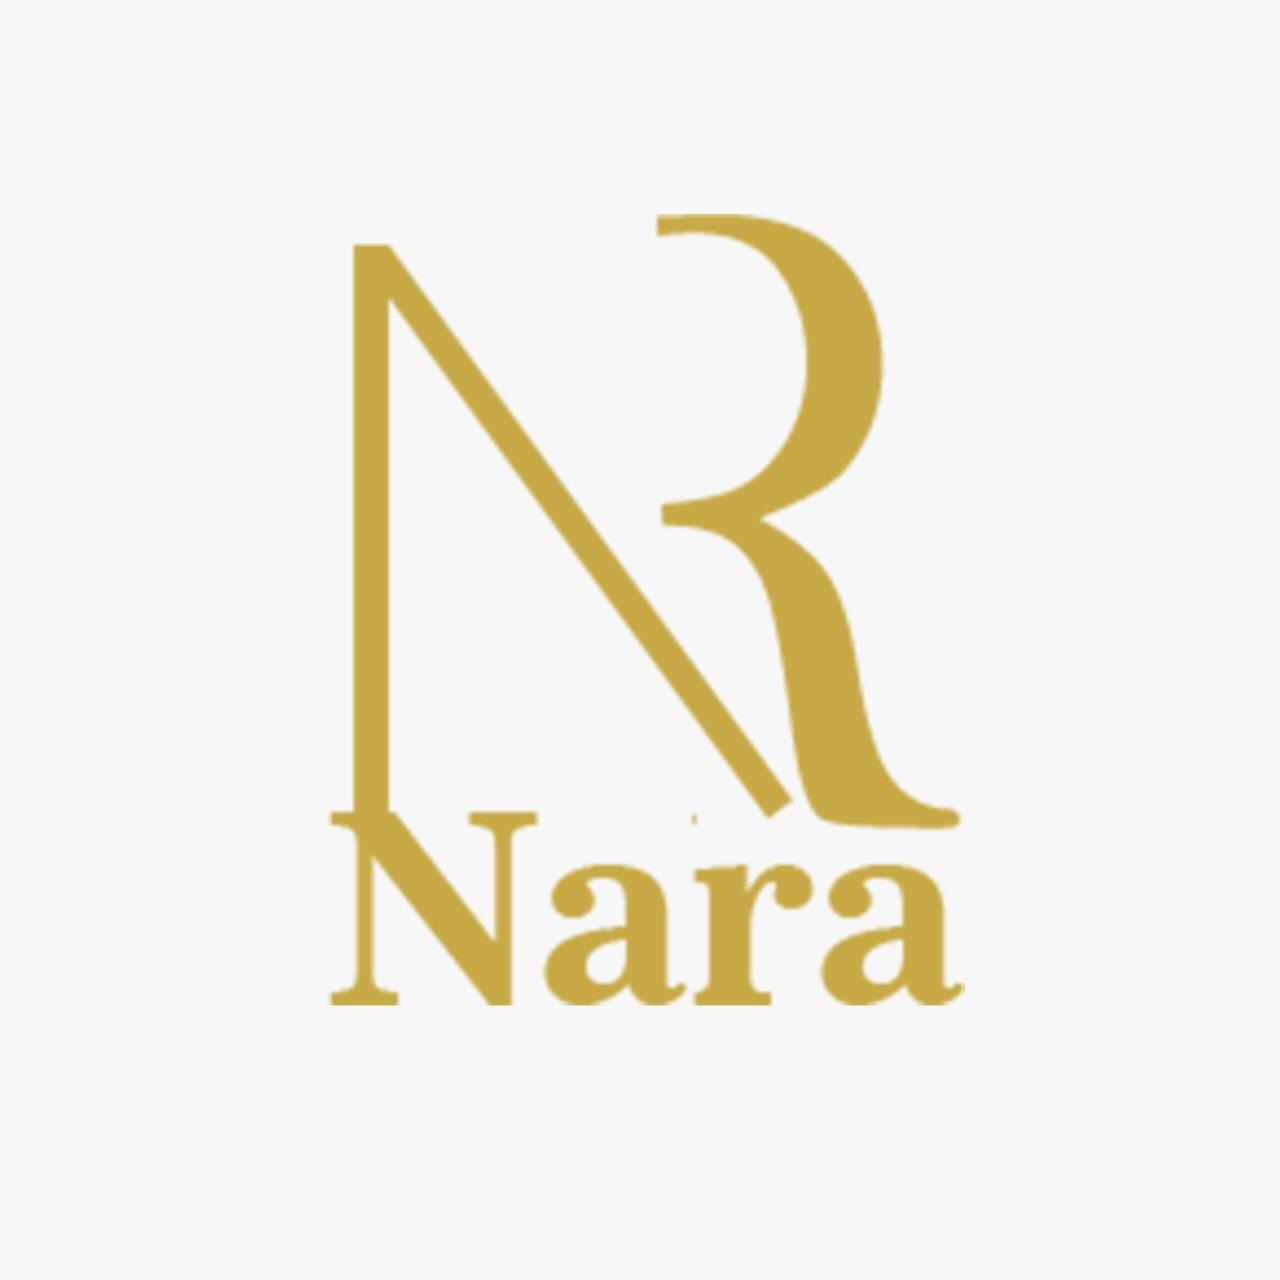 NaraOfficial